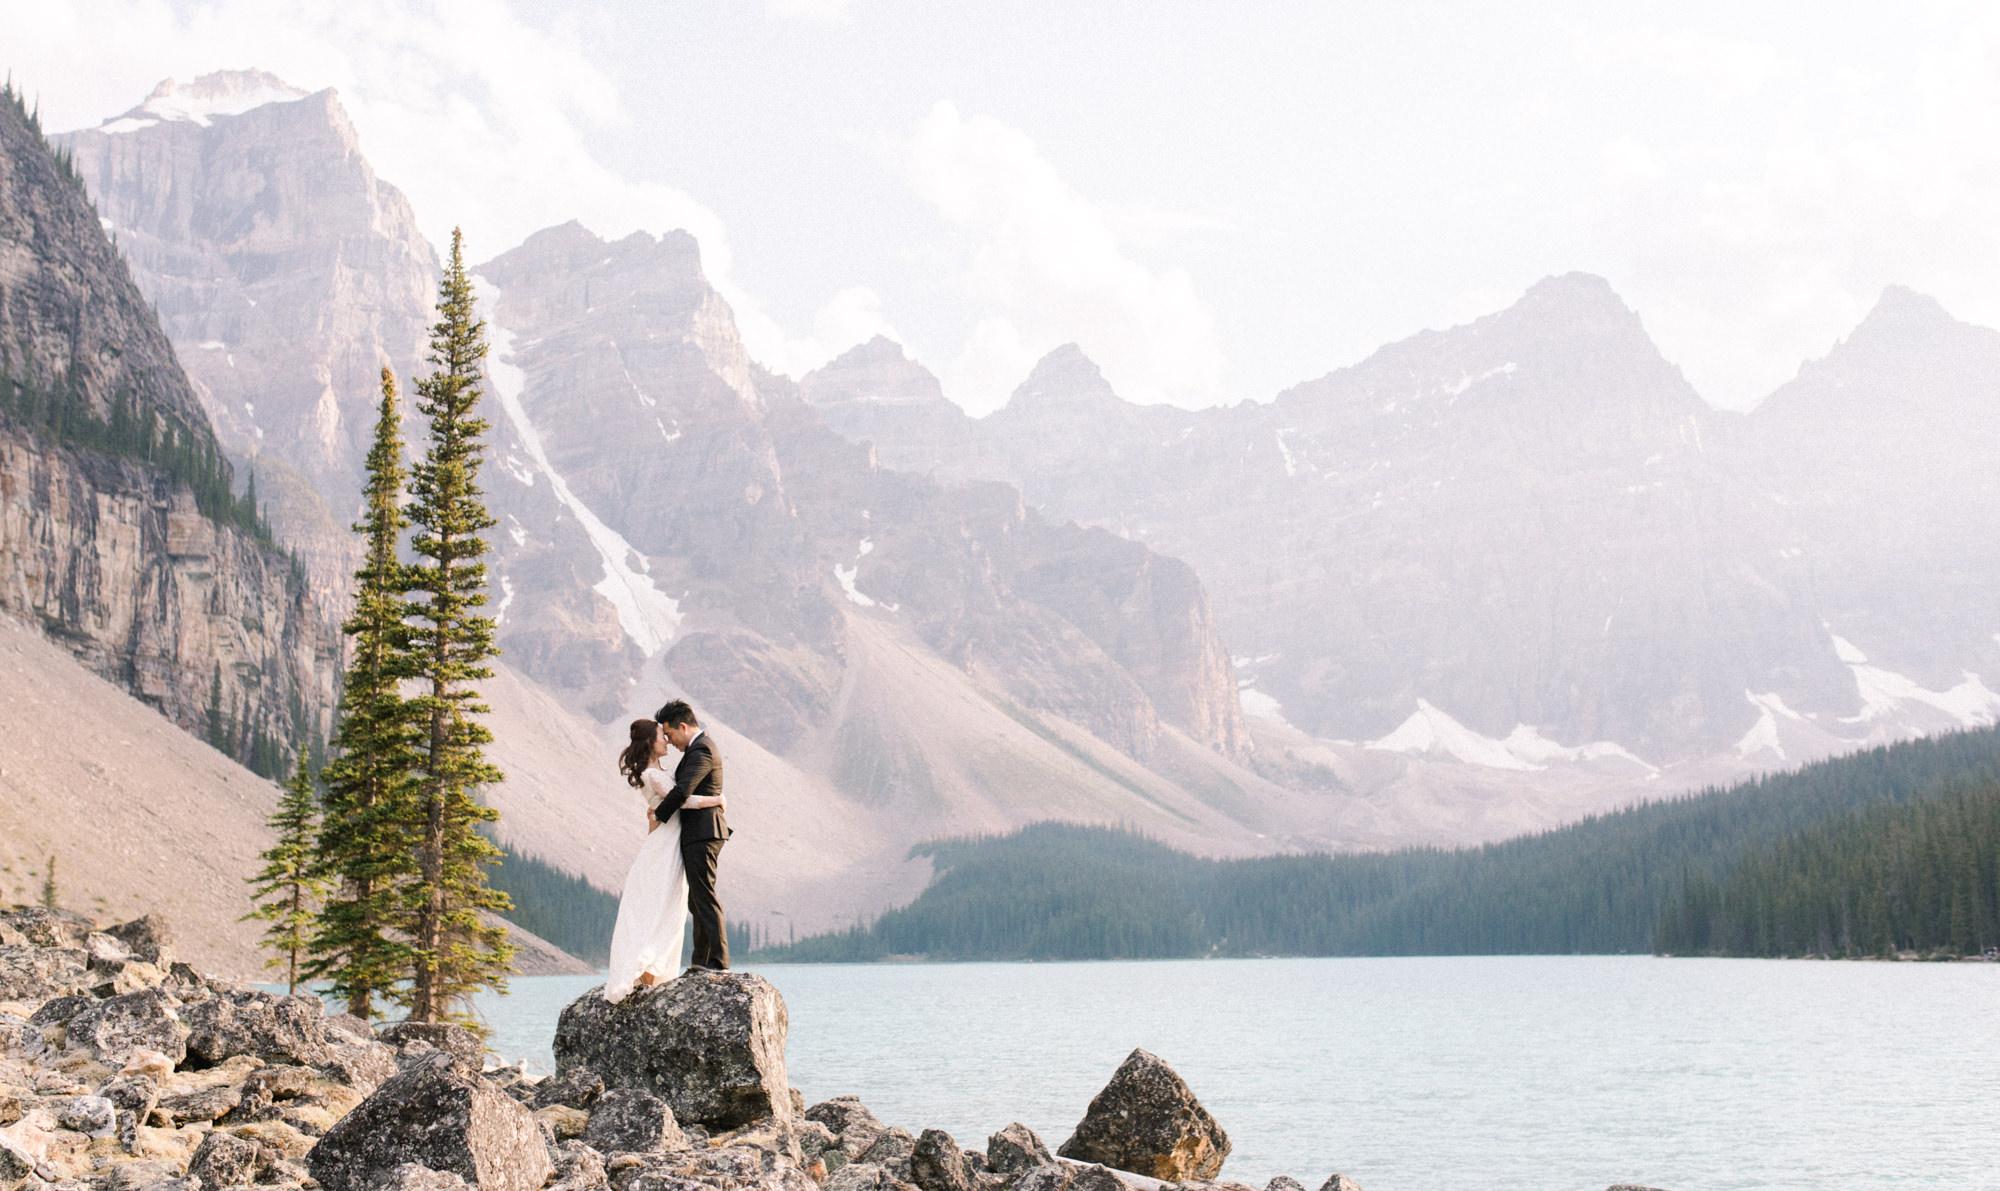 Motaine-Lake-wedding-photography-mountain-wedding-1.jpg